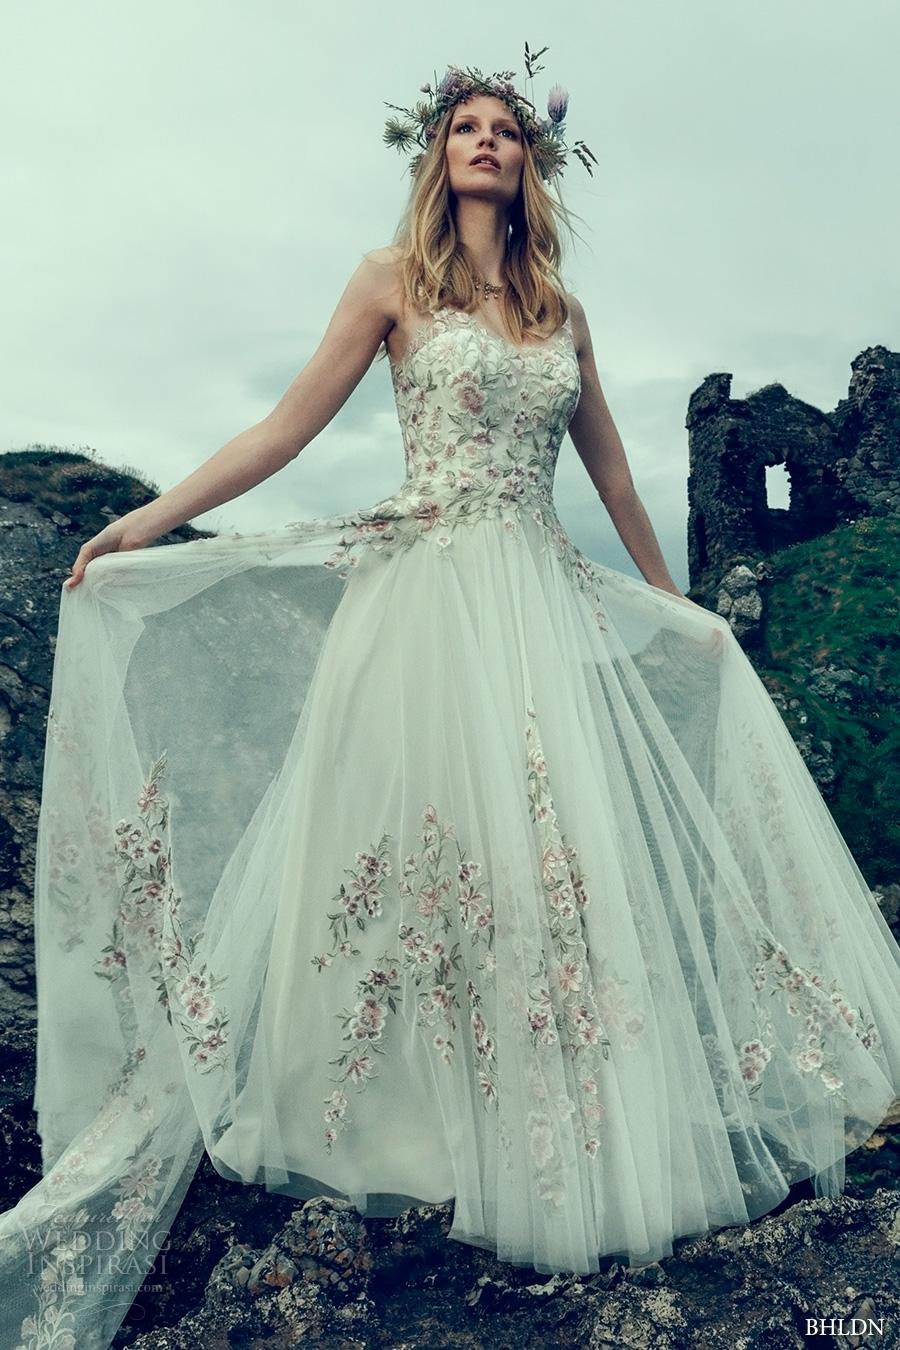 a628b774e74e bhldn fall 2016 bridal sleeveless illusion v neck sweetheart neckline  heavily embellished bodice tulle skirt romantic